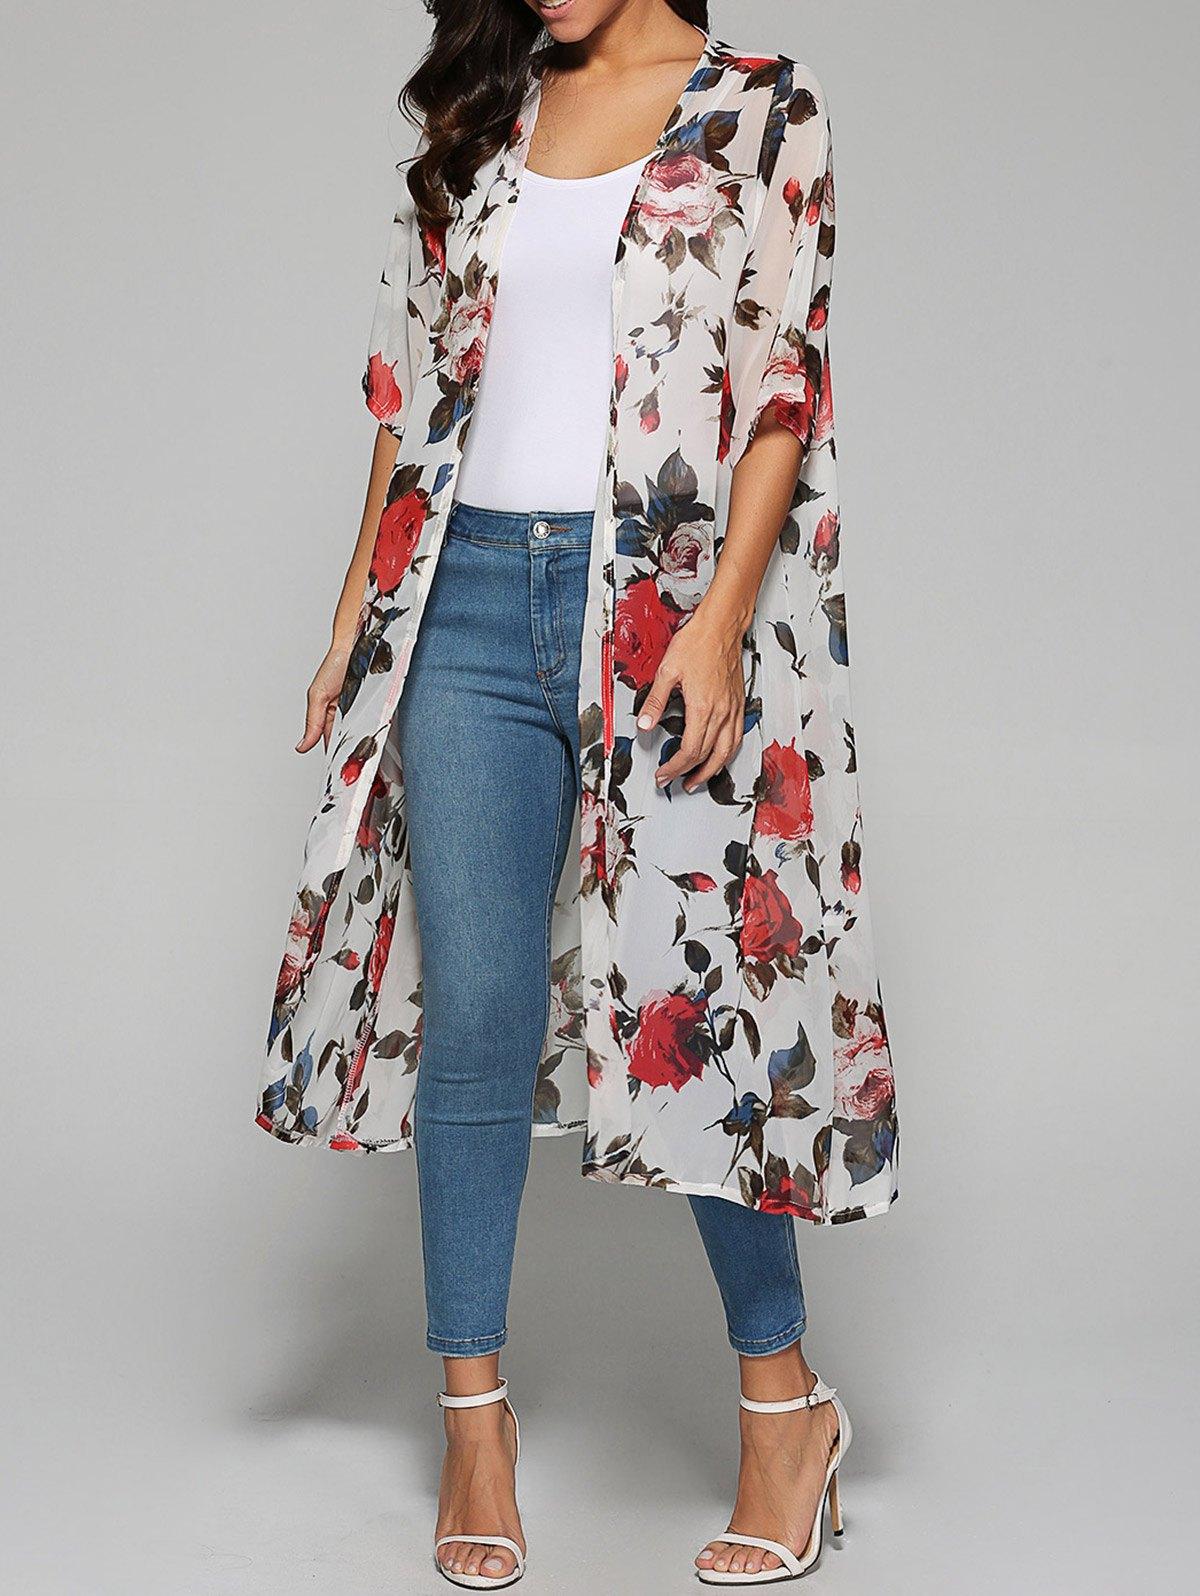 Rose Print Chiffon Kimono - White - ONE SIZE